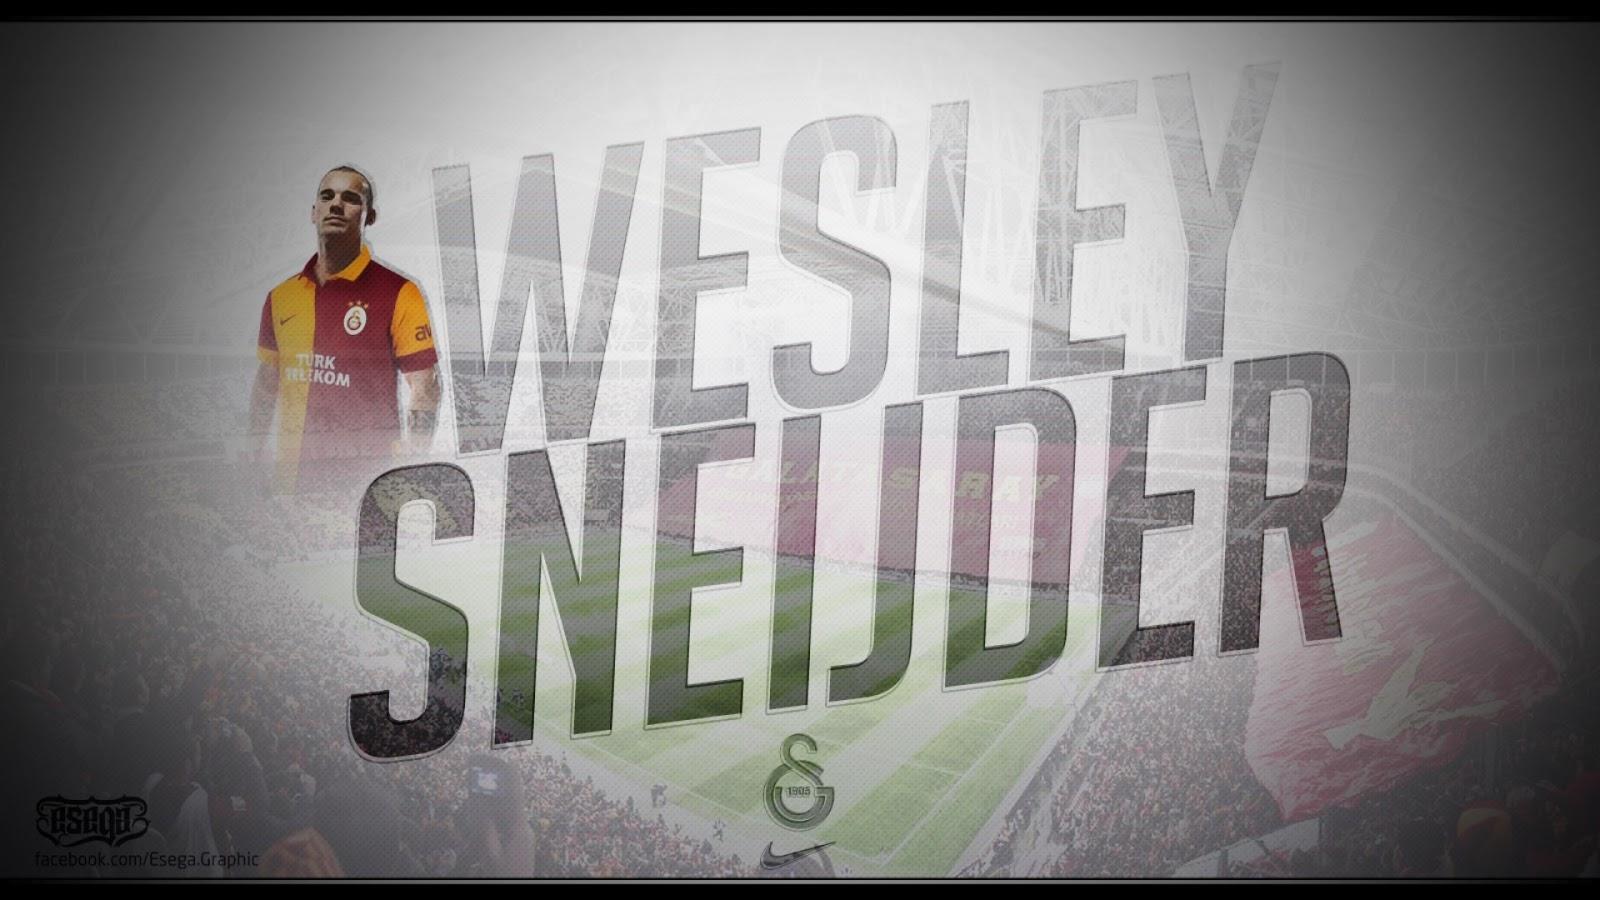 wesley+sneijder+galatasaray+resimleri+rooteto+6 Wesley Sneijder Galatasaray HD Resimleri